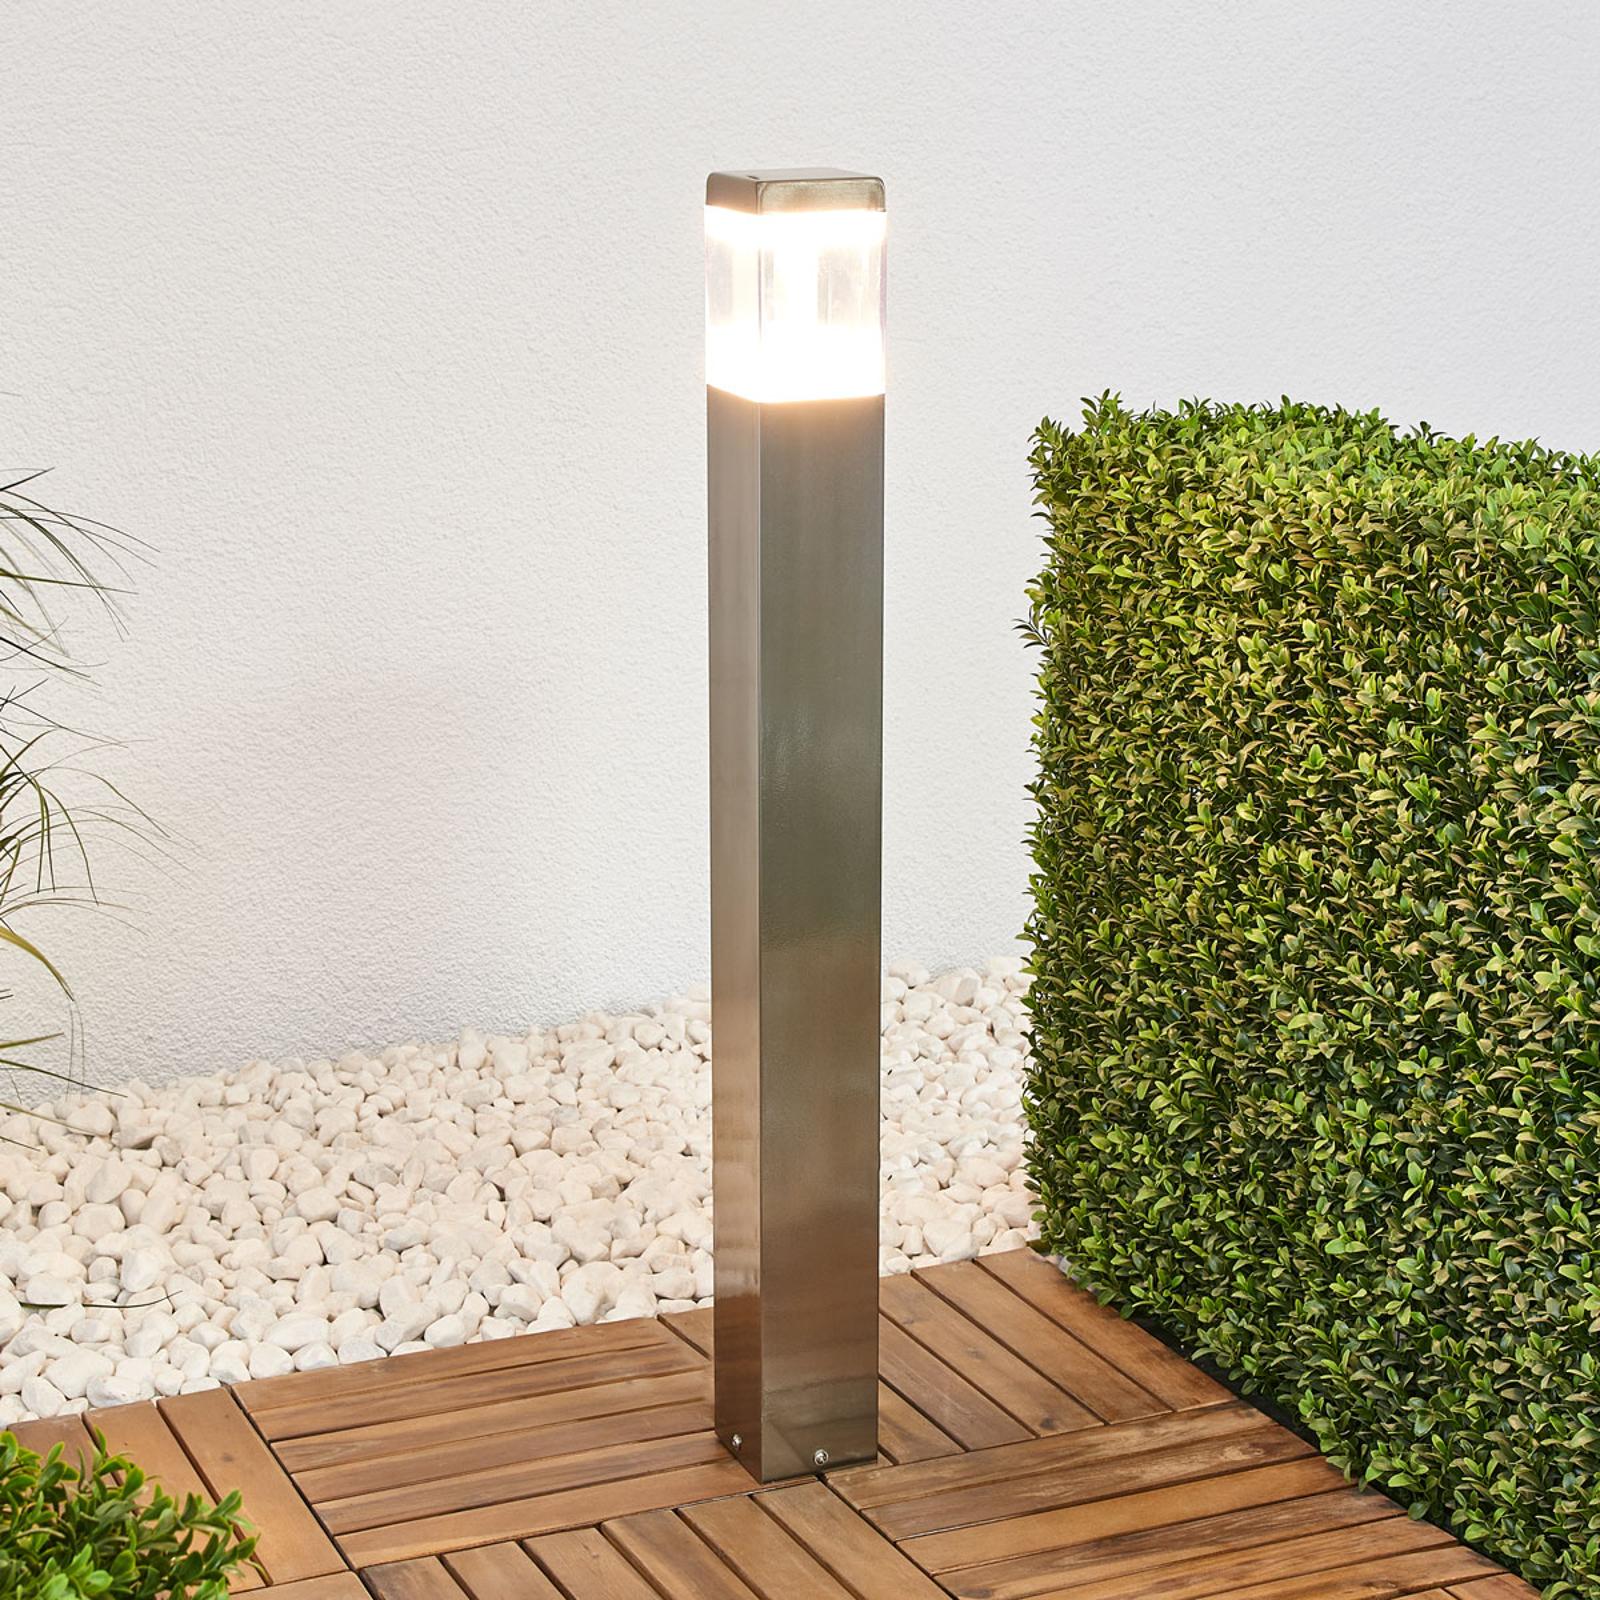 Baily - veilampe av rustfritt stål med LED-lys